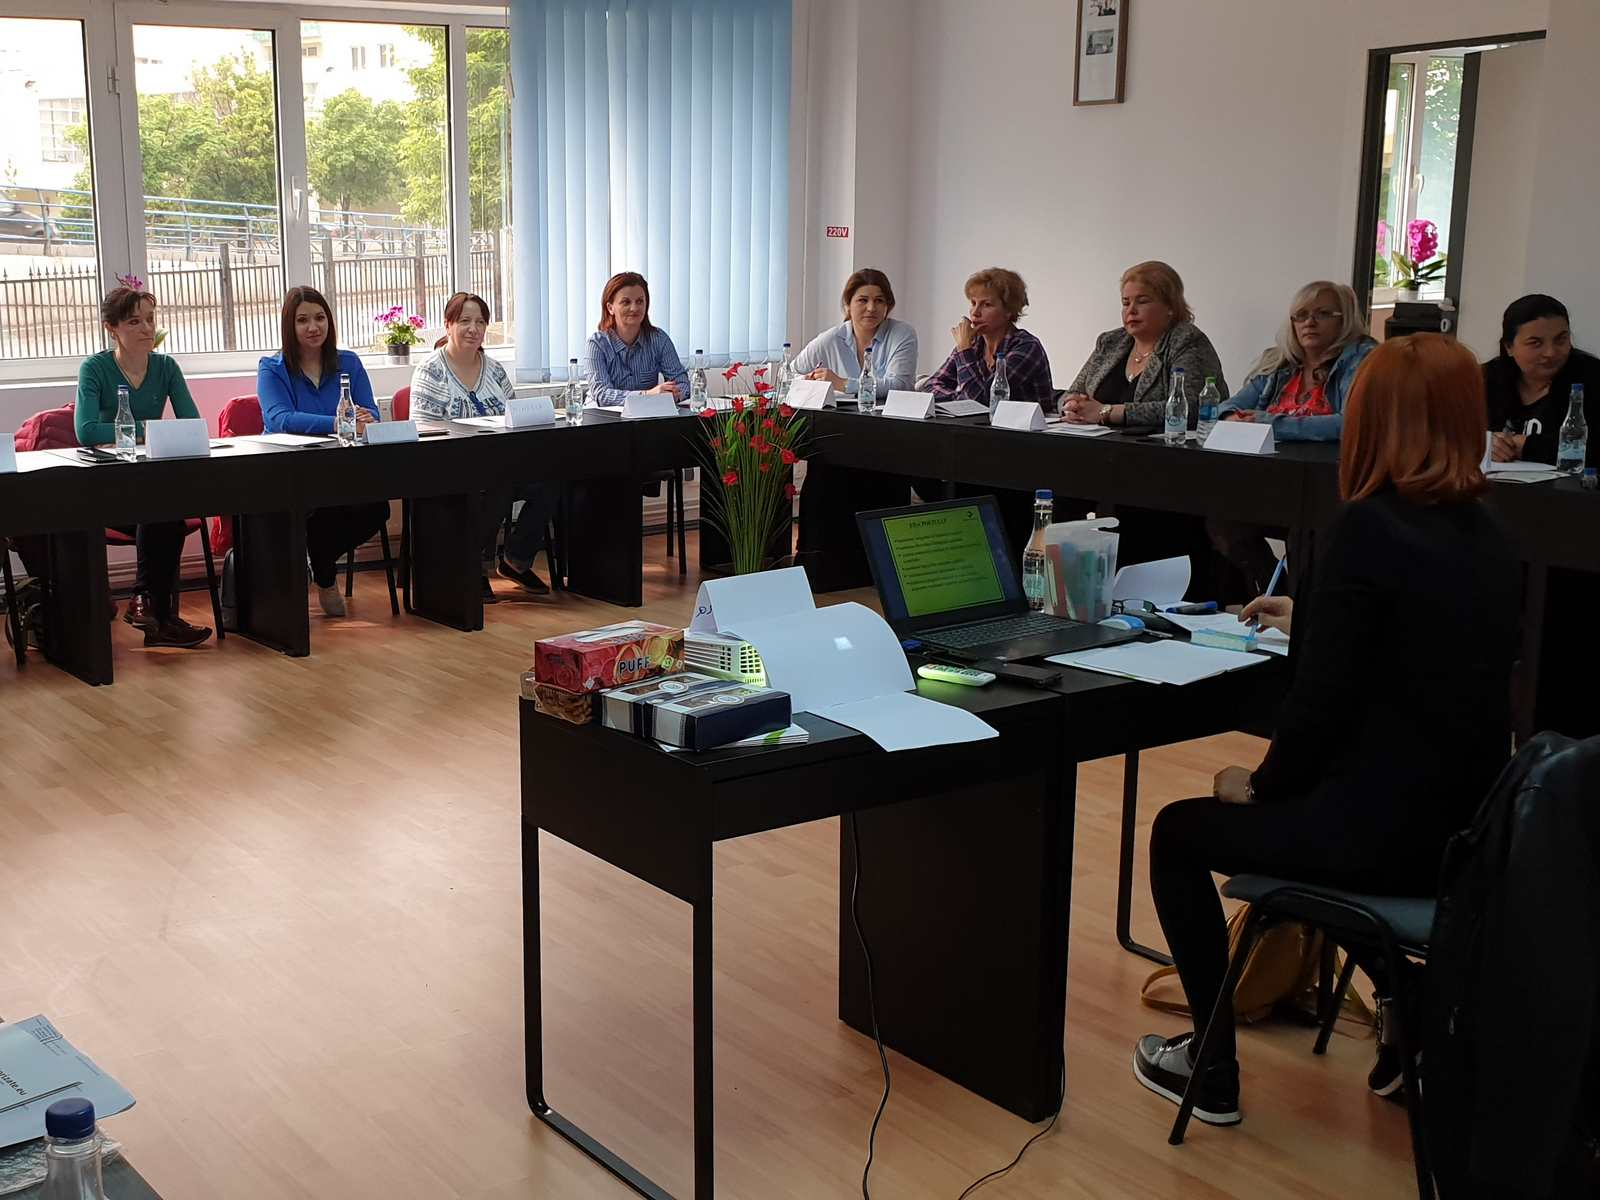 Curs asistent comunicare si relatii publice – Curs Viitor